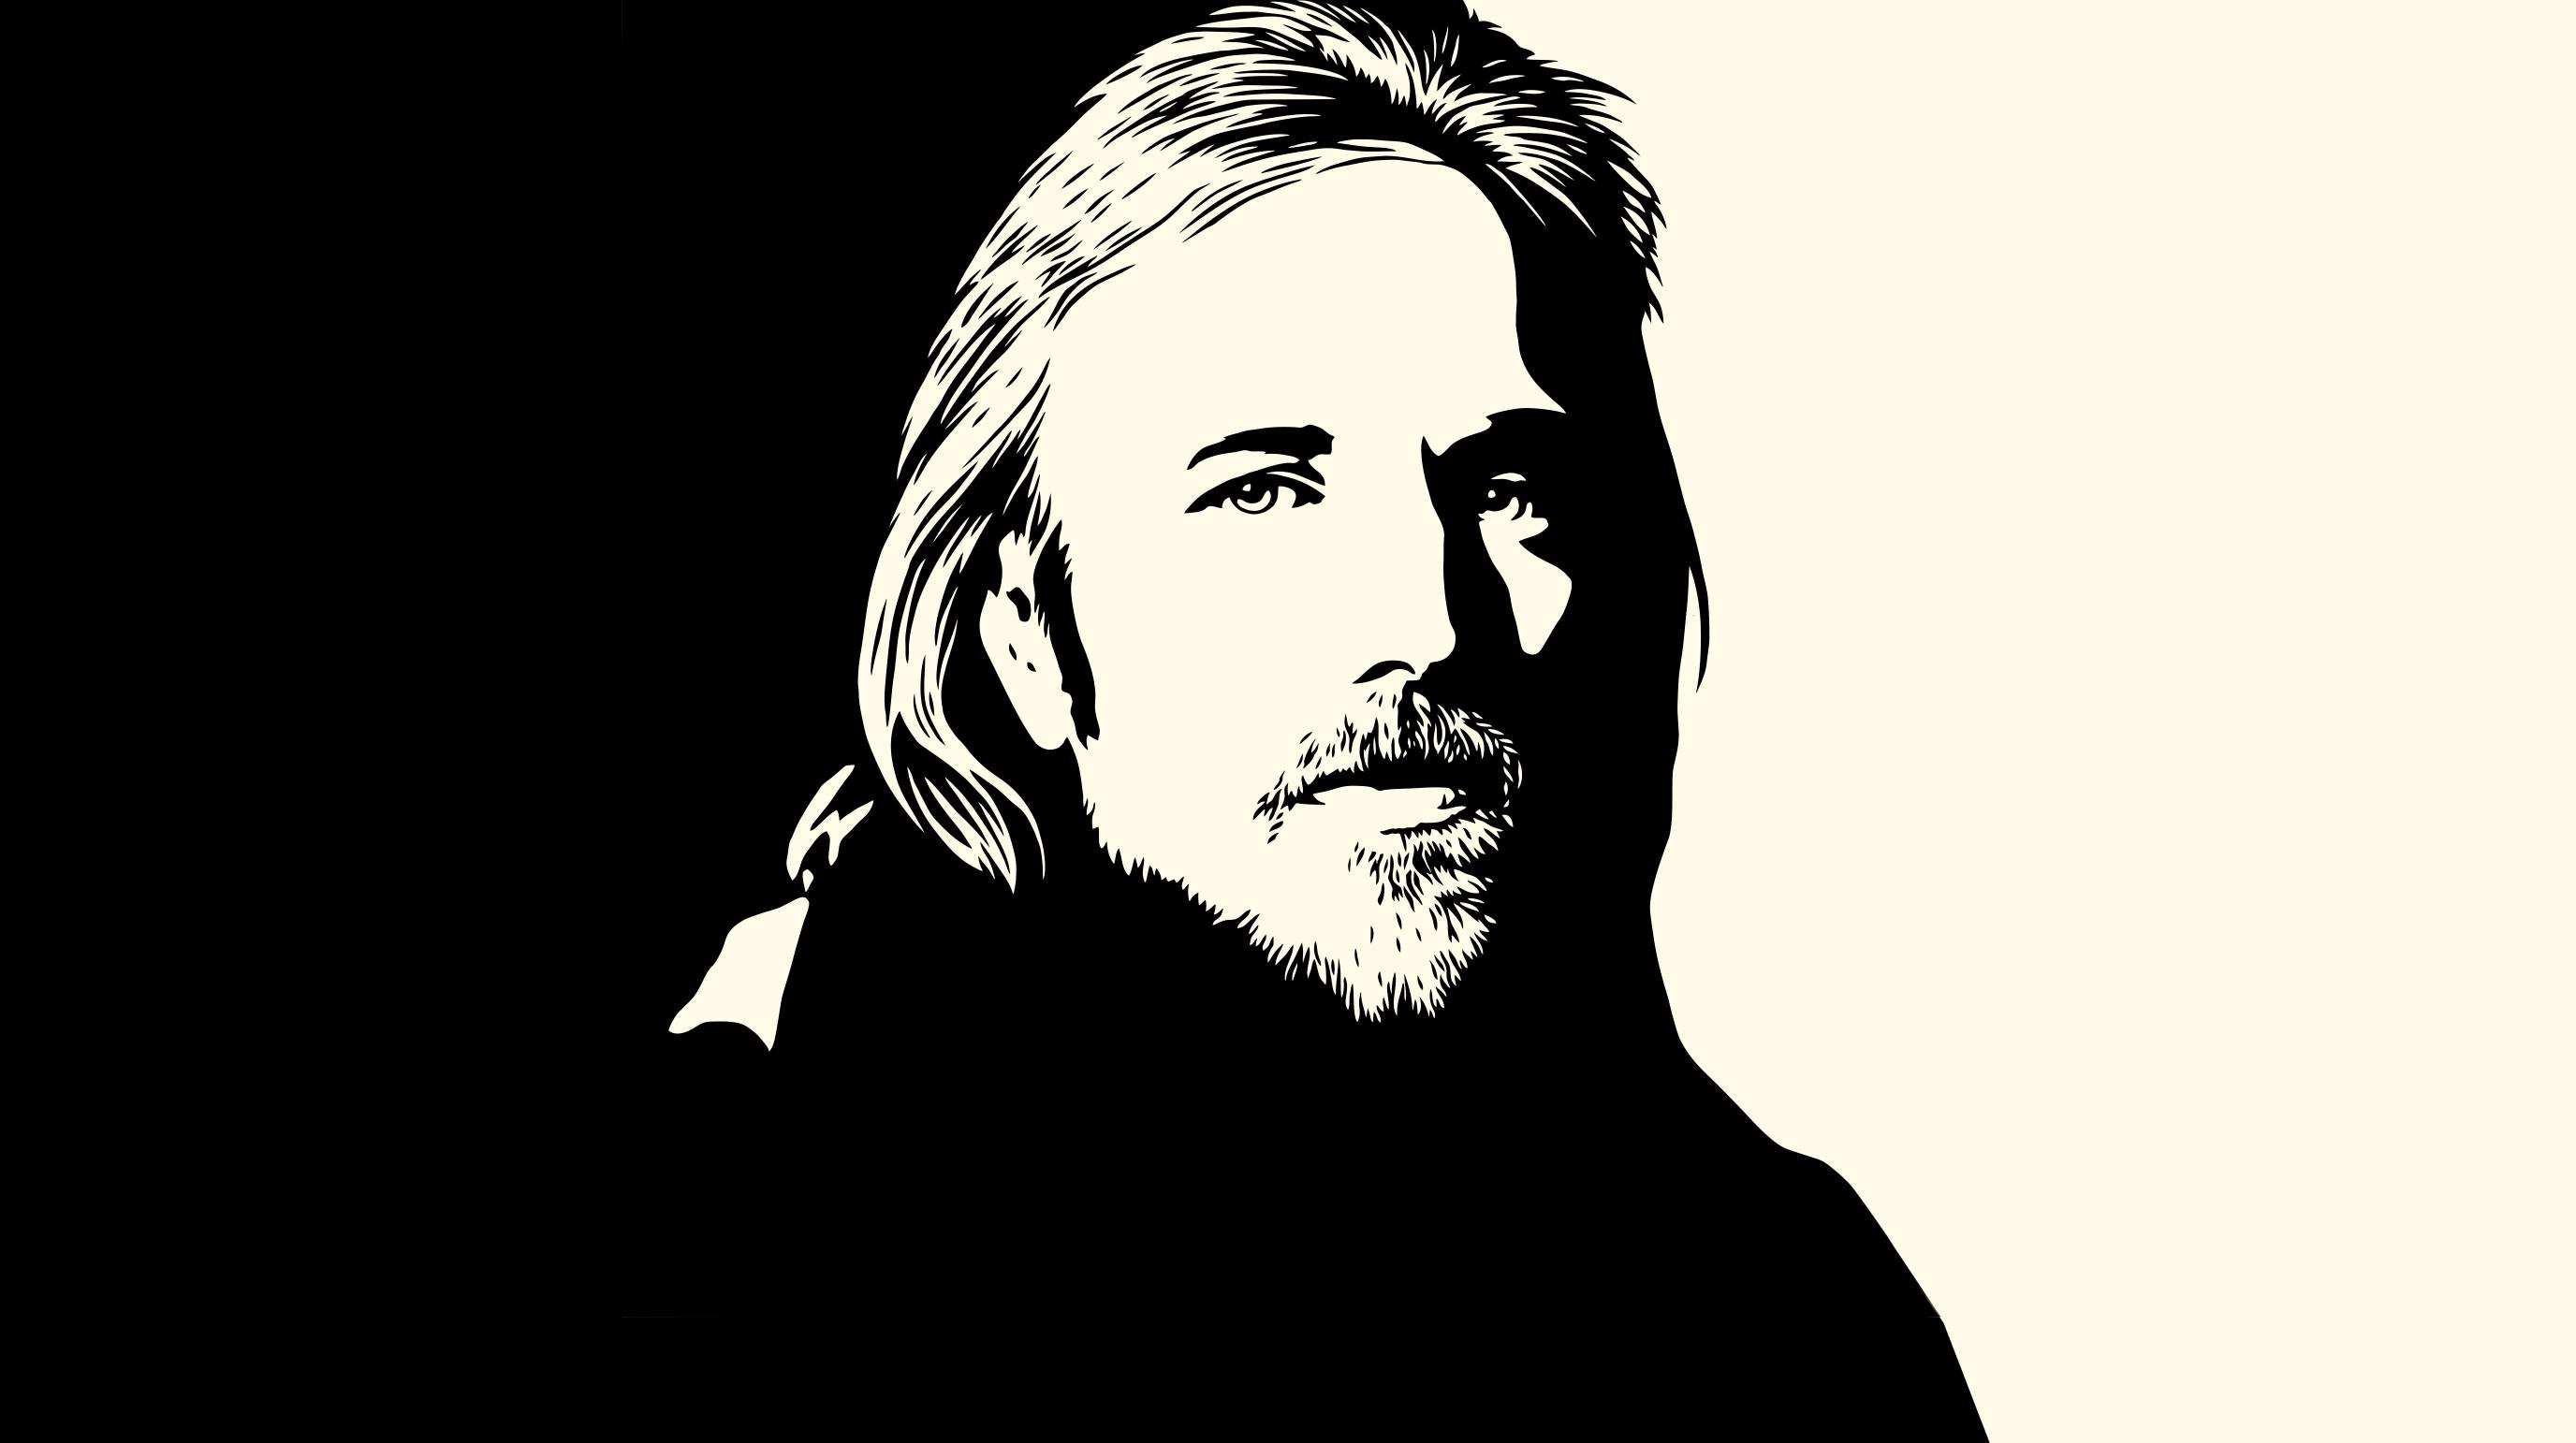 Plaat van de week: Tom Petty And The Heartbreakers – Keep A Little Soul